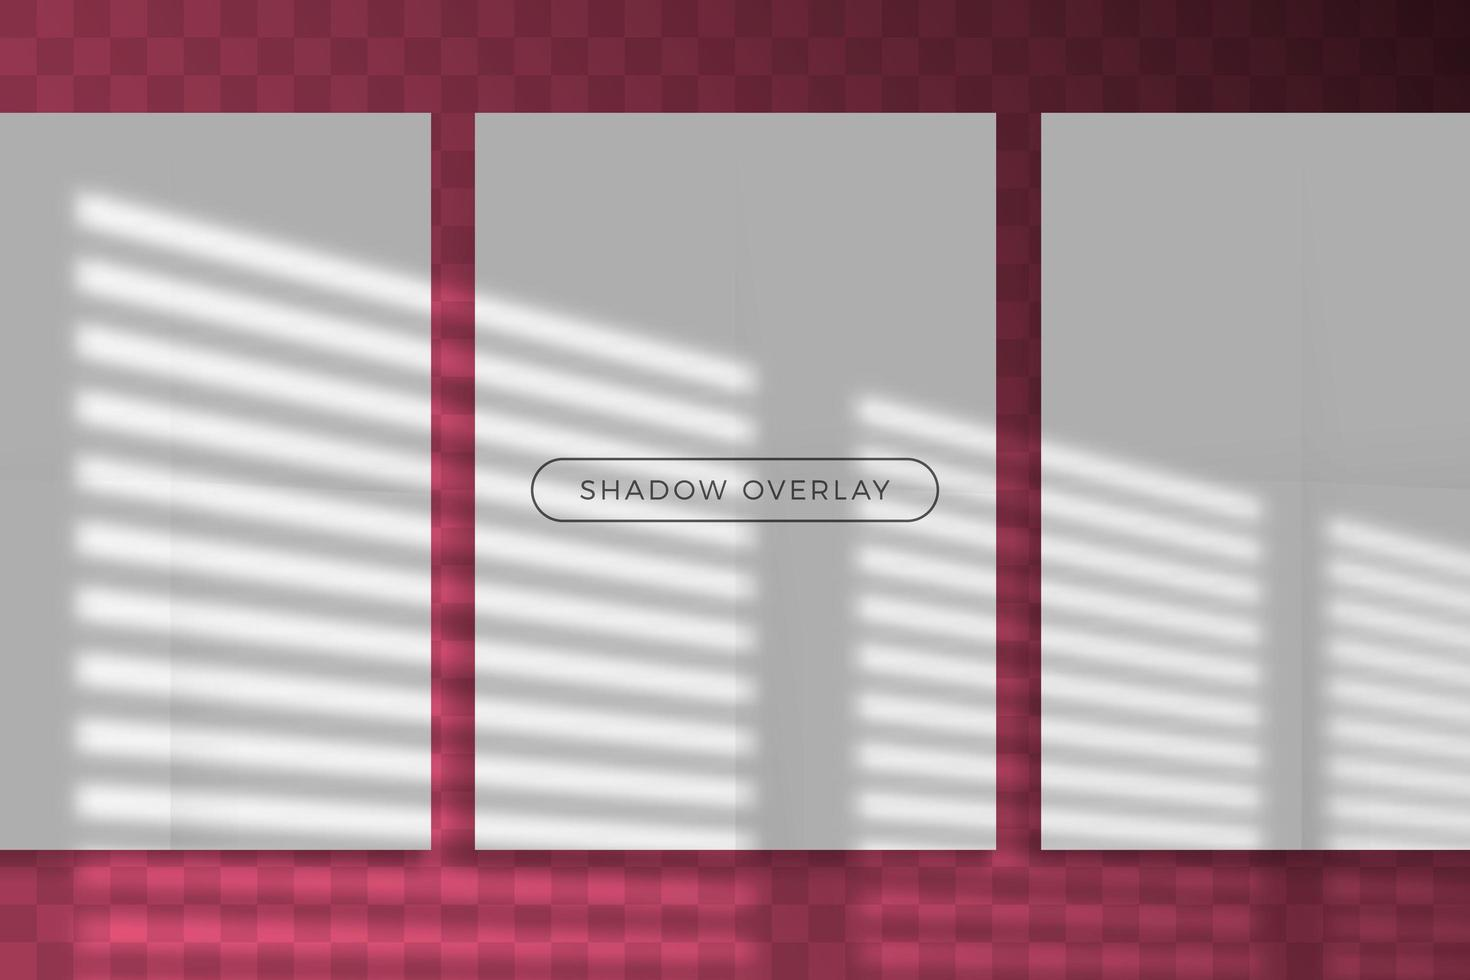 Overlay shadow of natural lighting branding mockup vector